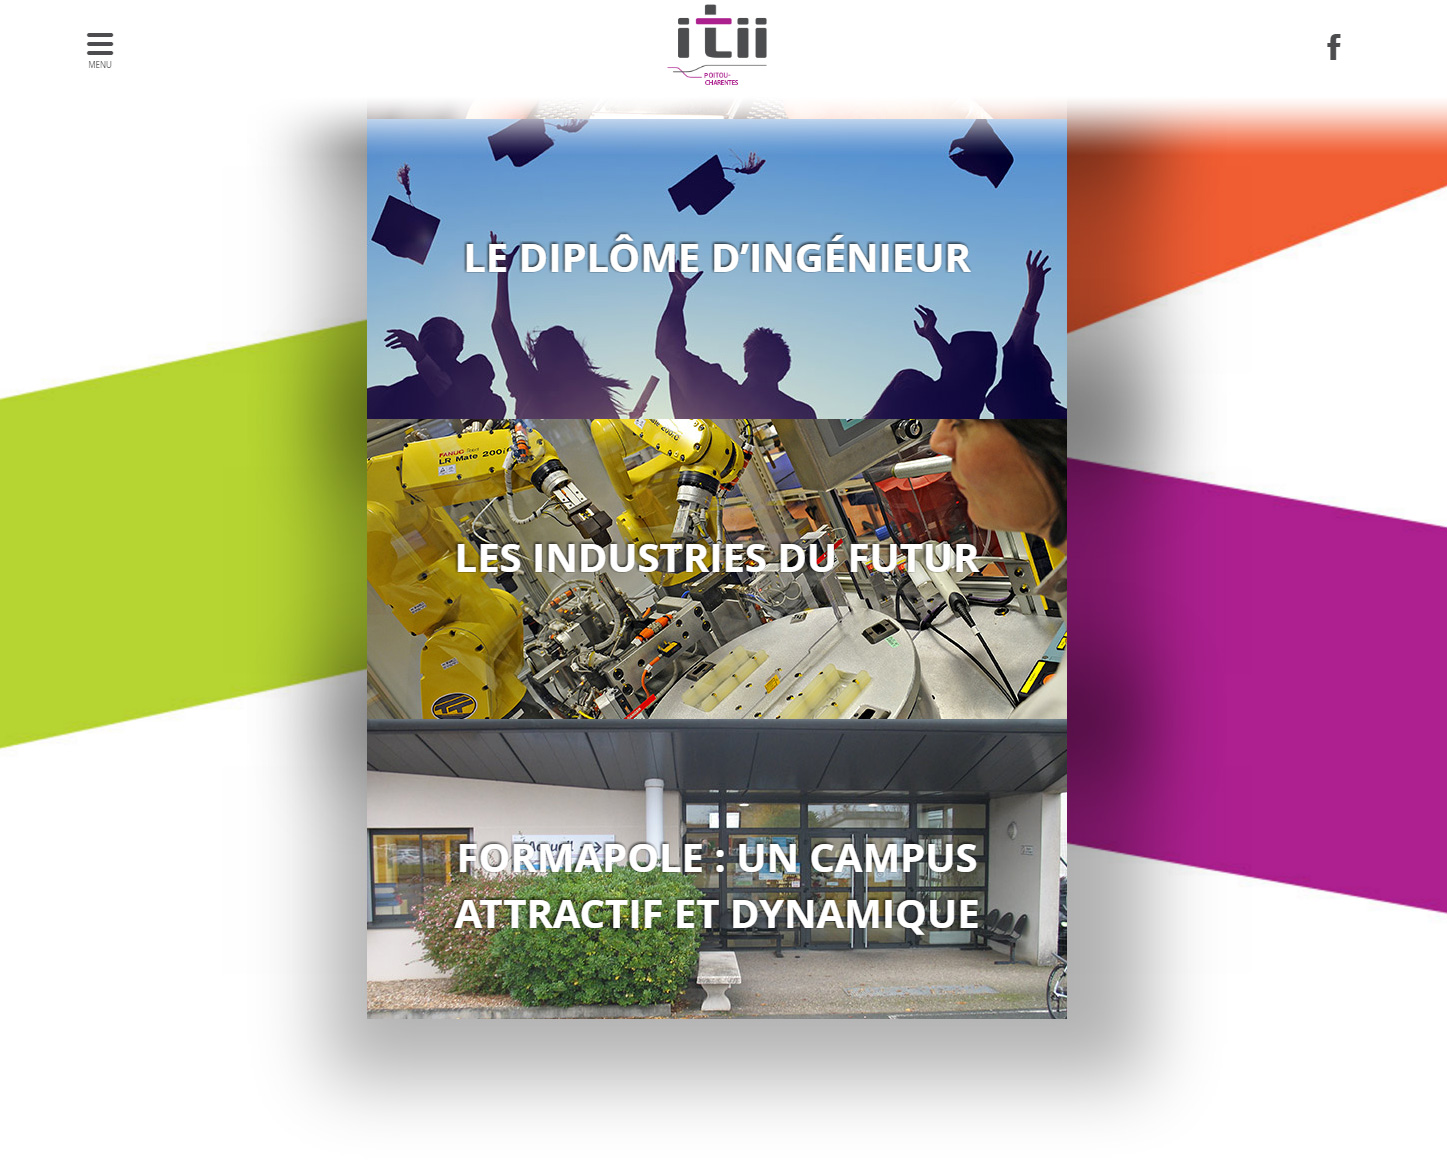 creation-de-site-internet-a-poitiers-infographsite-poitiers-Ecole-d-ingenieur-ITII